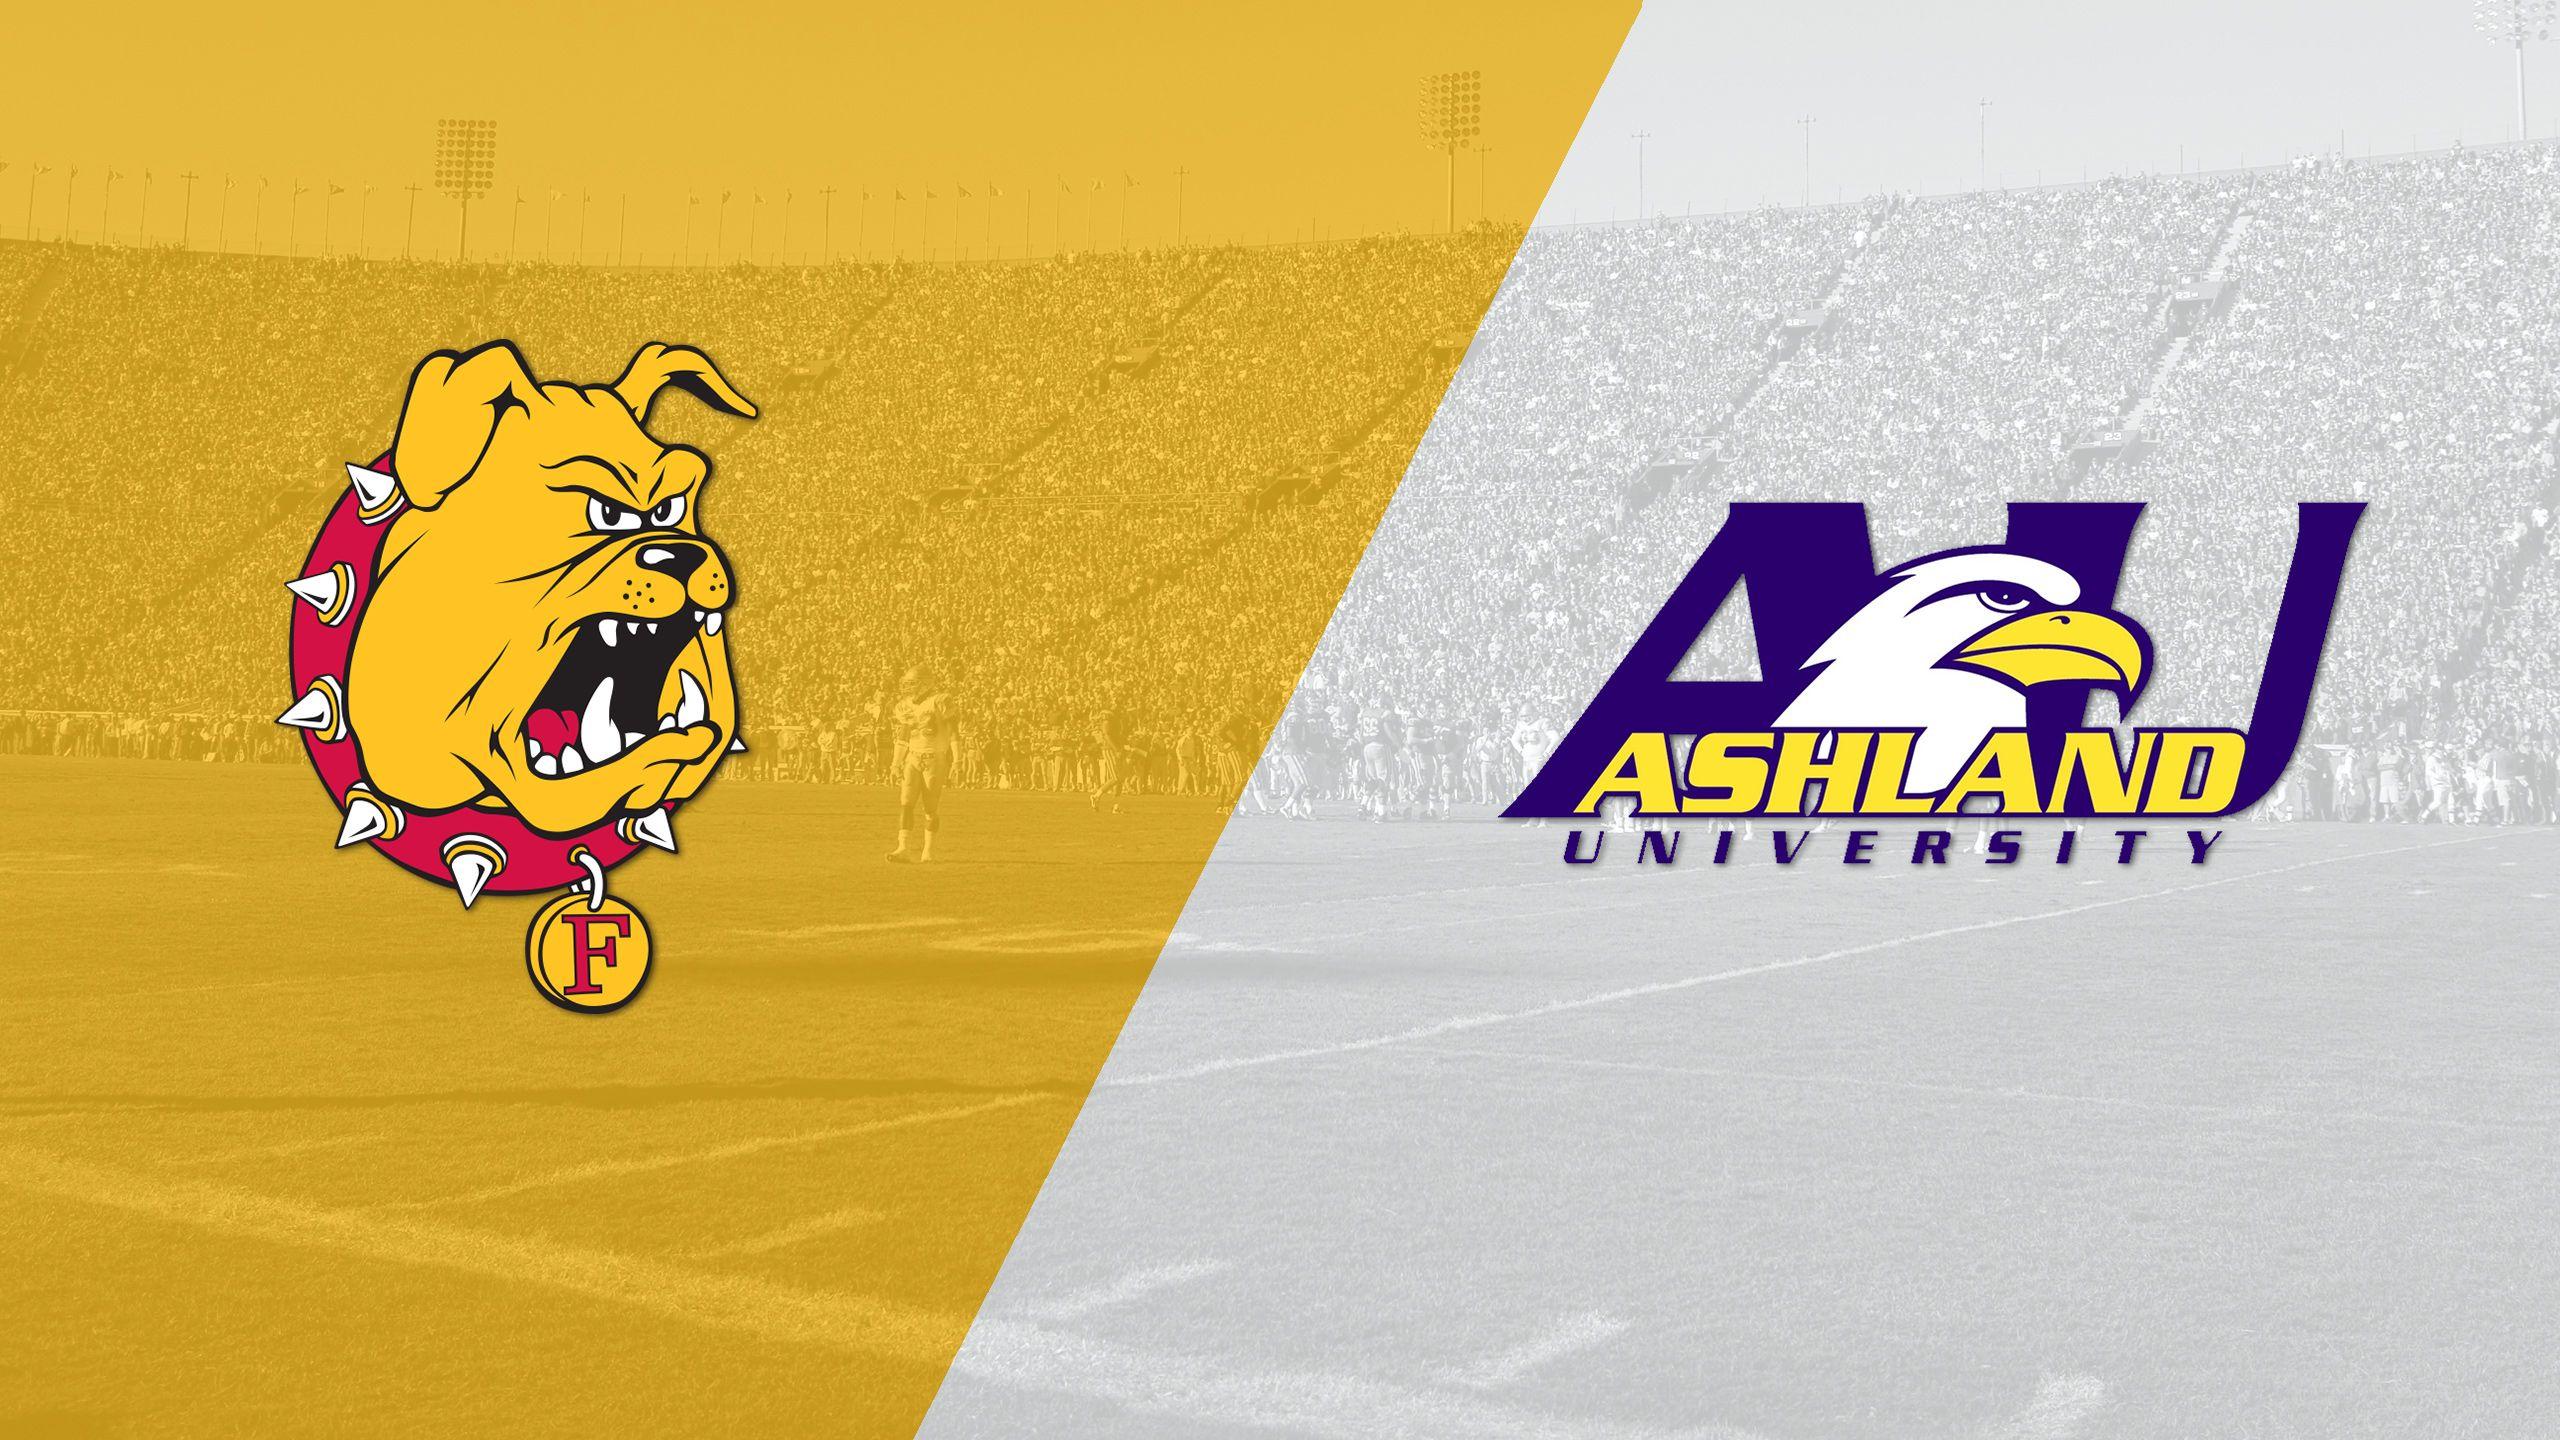 Ferris State (MI) vs. Ashland (Football)